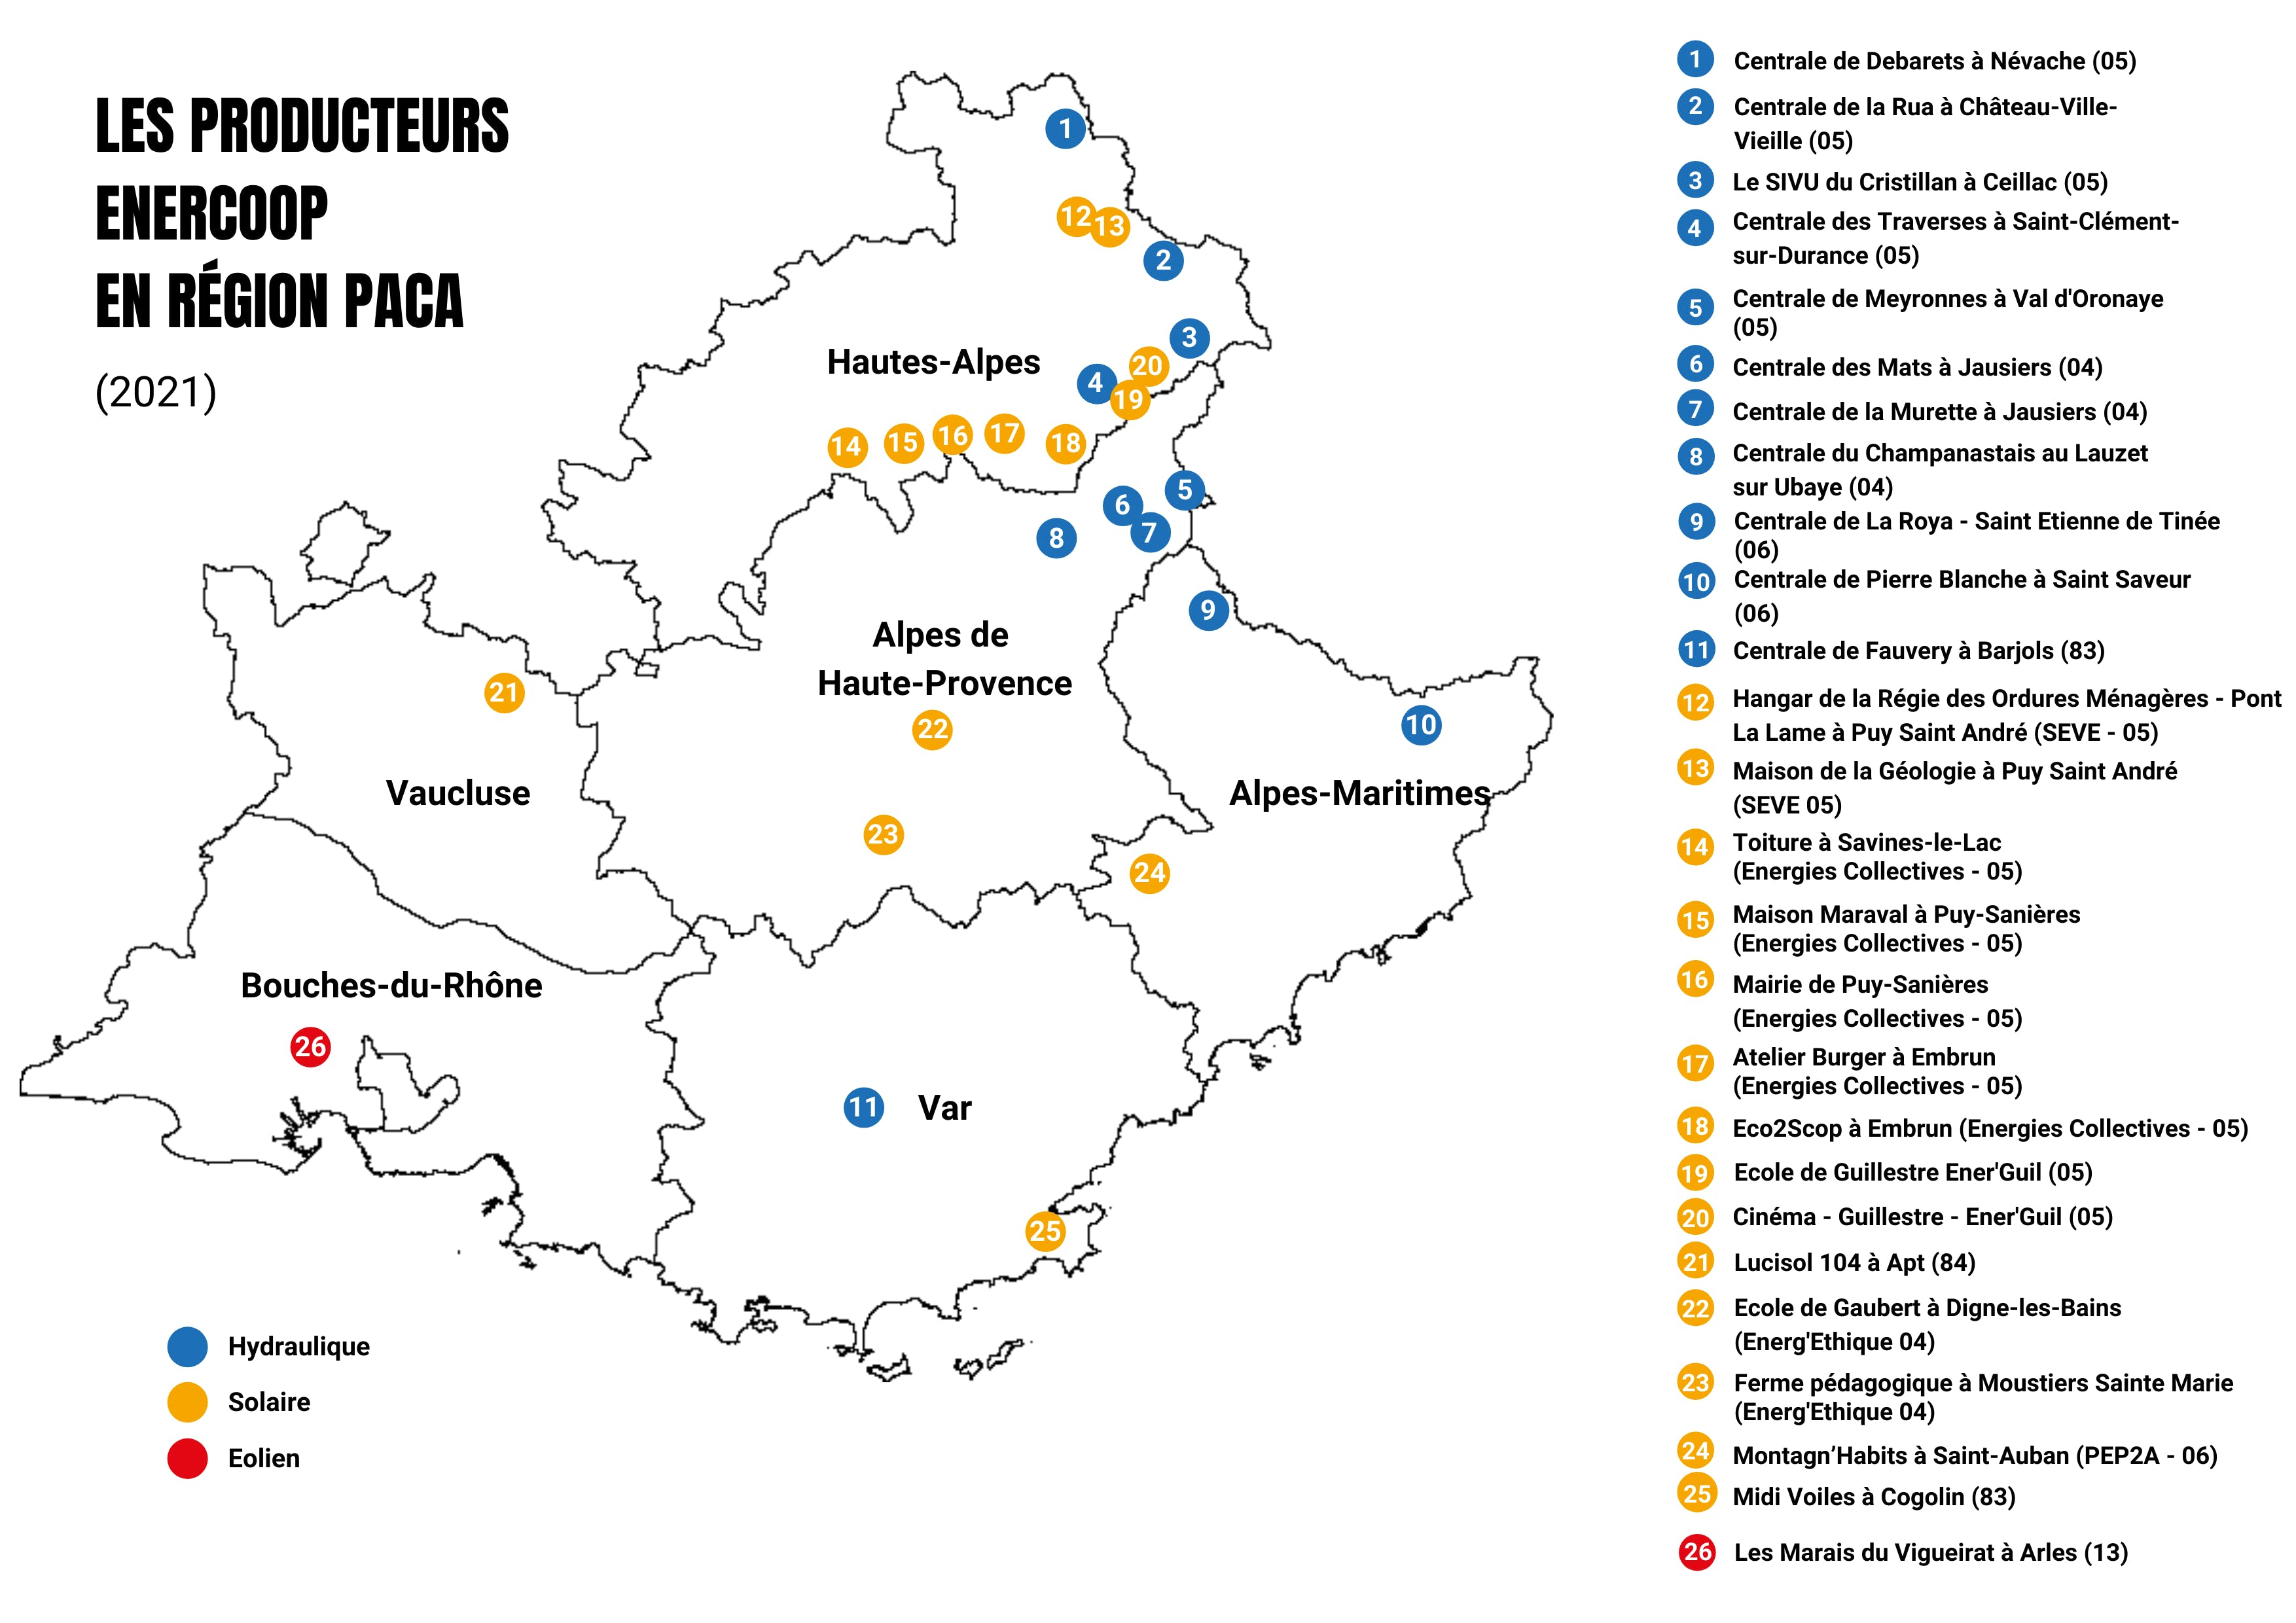 Enercoop Paca - Carte des producteurs 2021